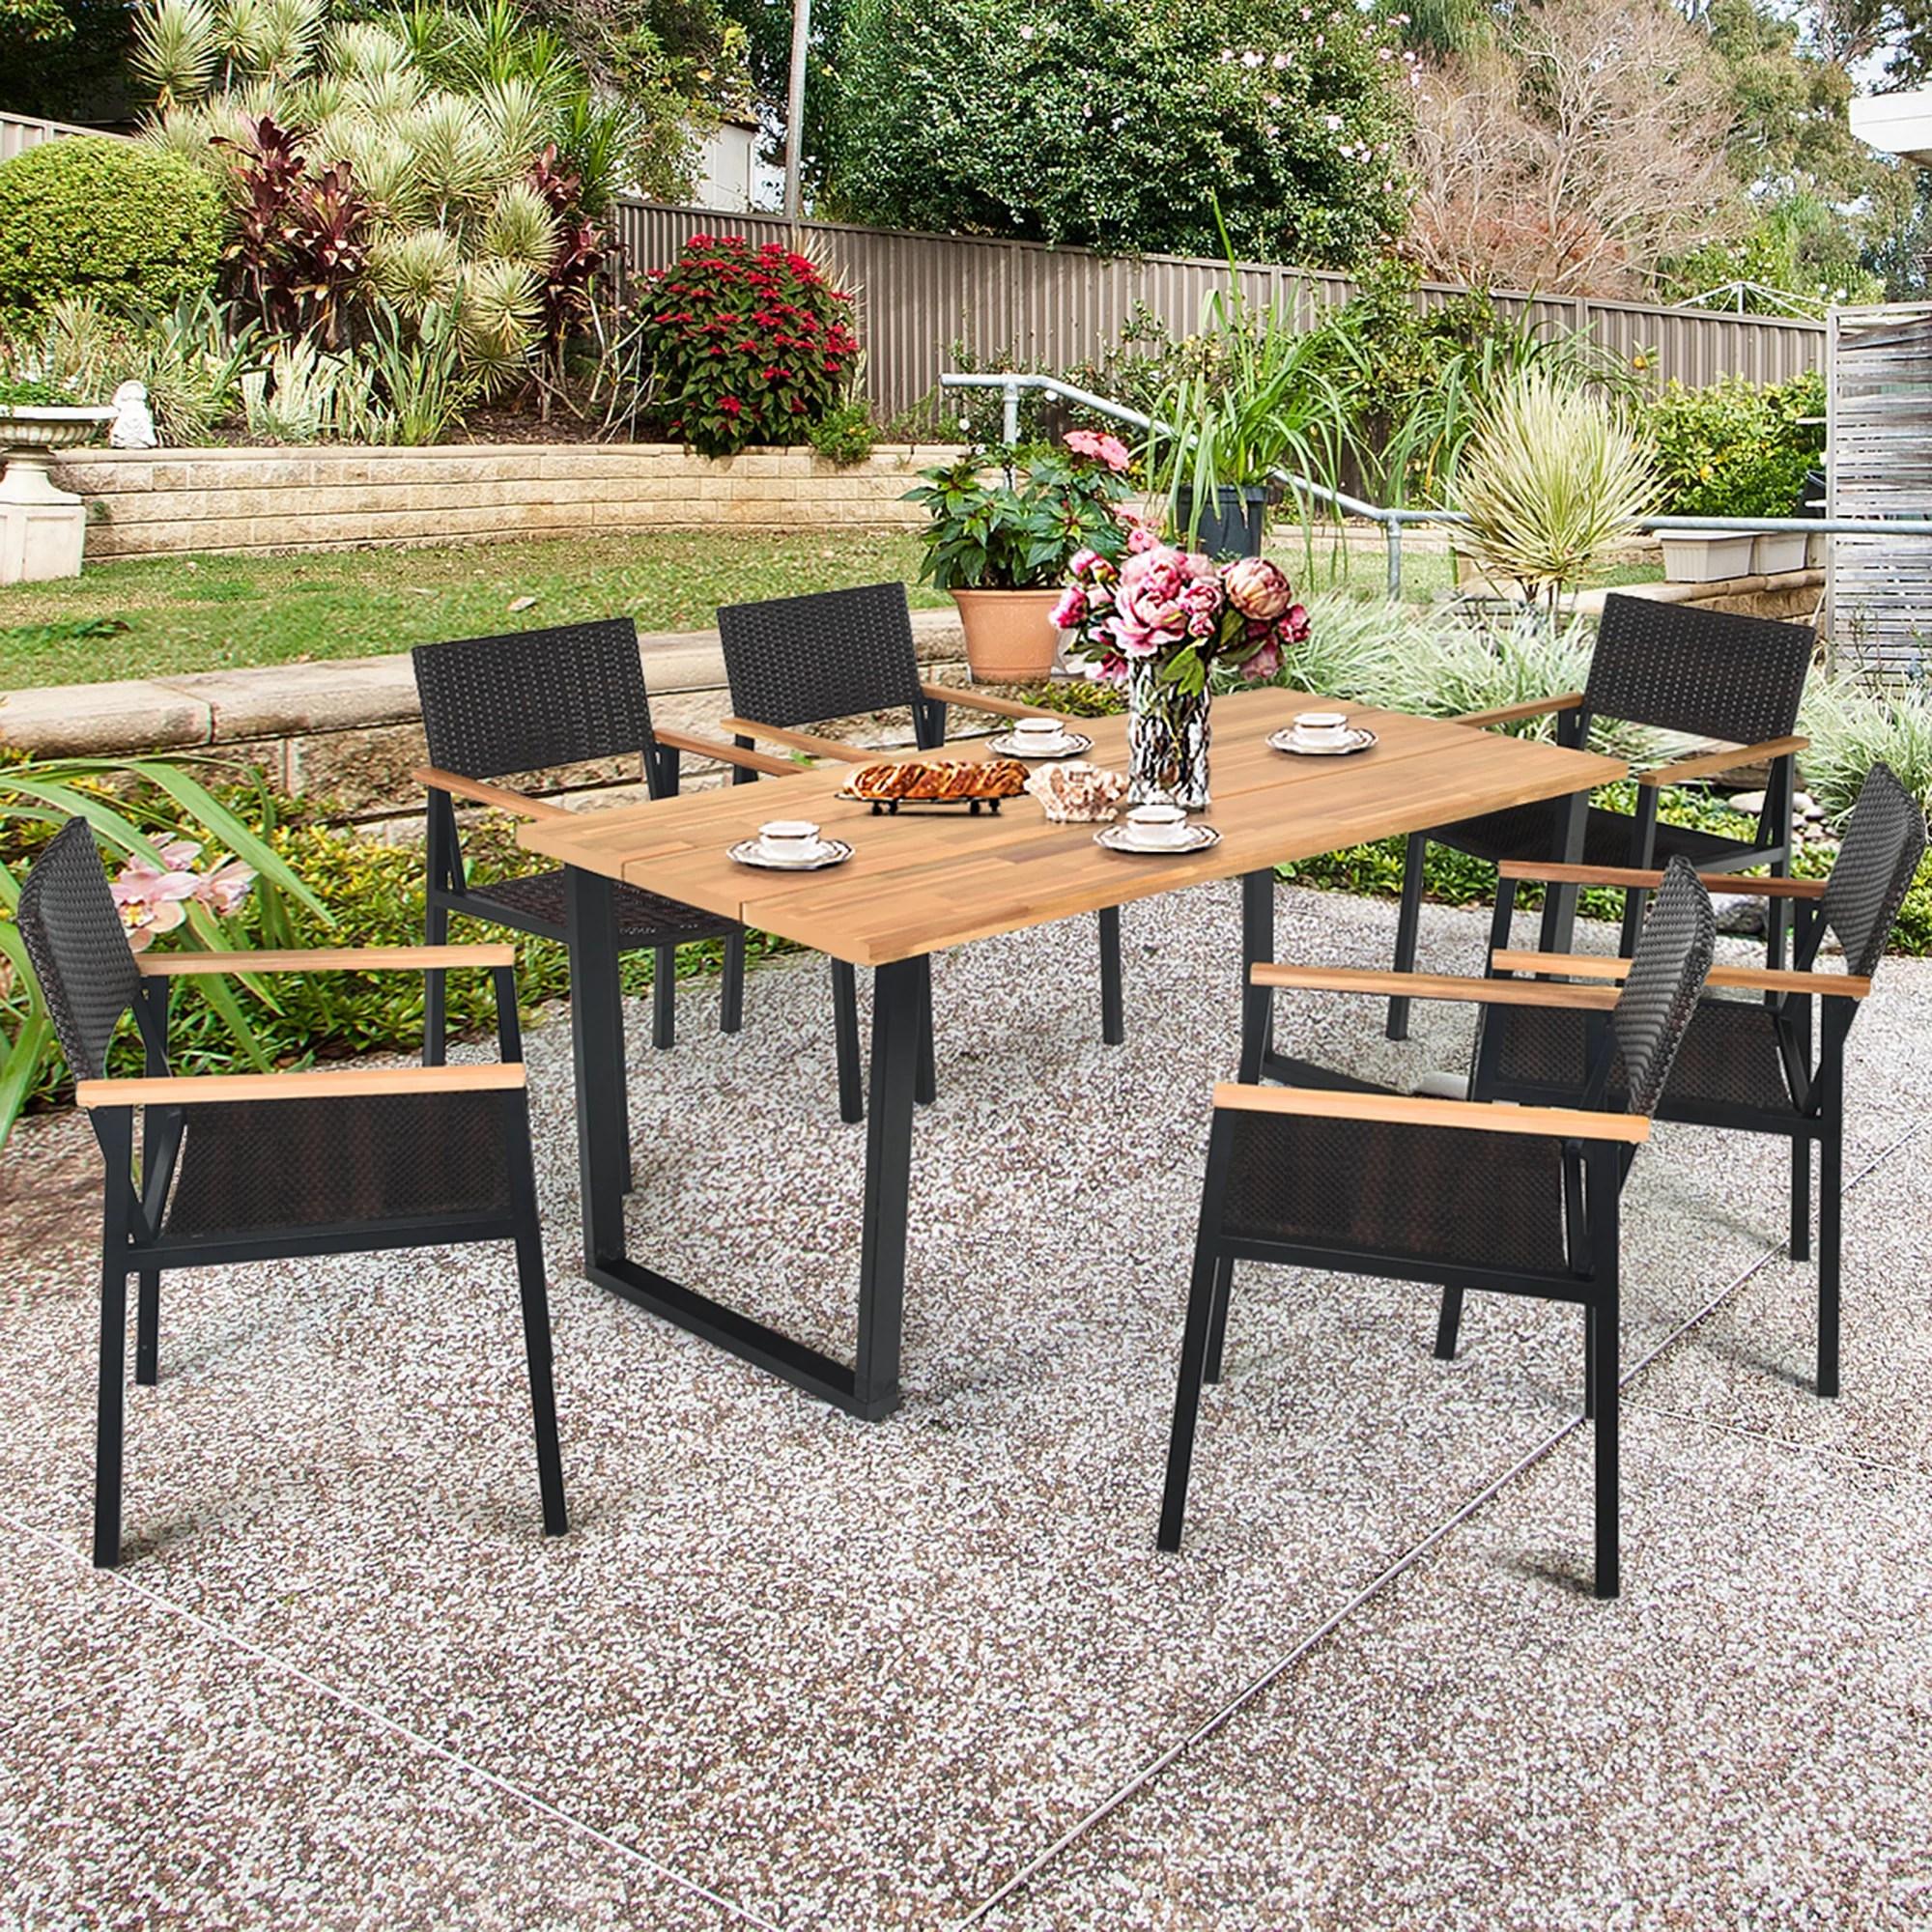 gymax 7pcs patio garden dining set outdoor dining furniture set w umbrella hole